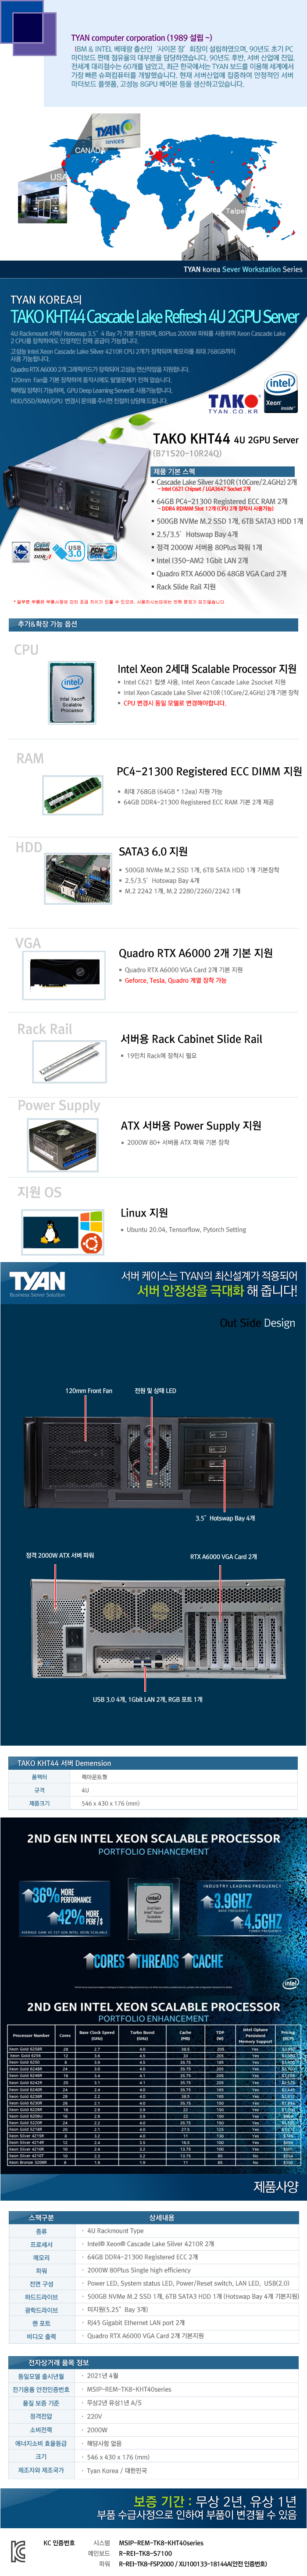 TYAN TAKO-KHT44-(B71S20-10R24Q)-RTX A6000 2GPU (128GB, M2 500GB + 6TB)